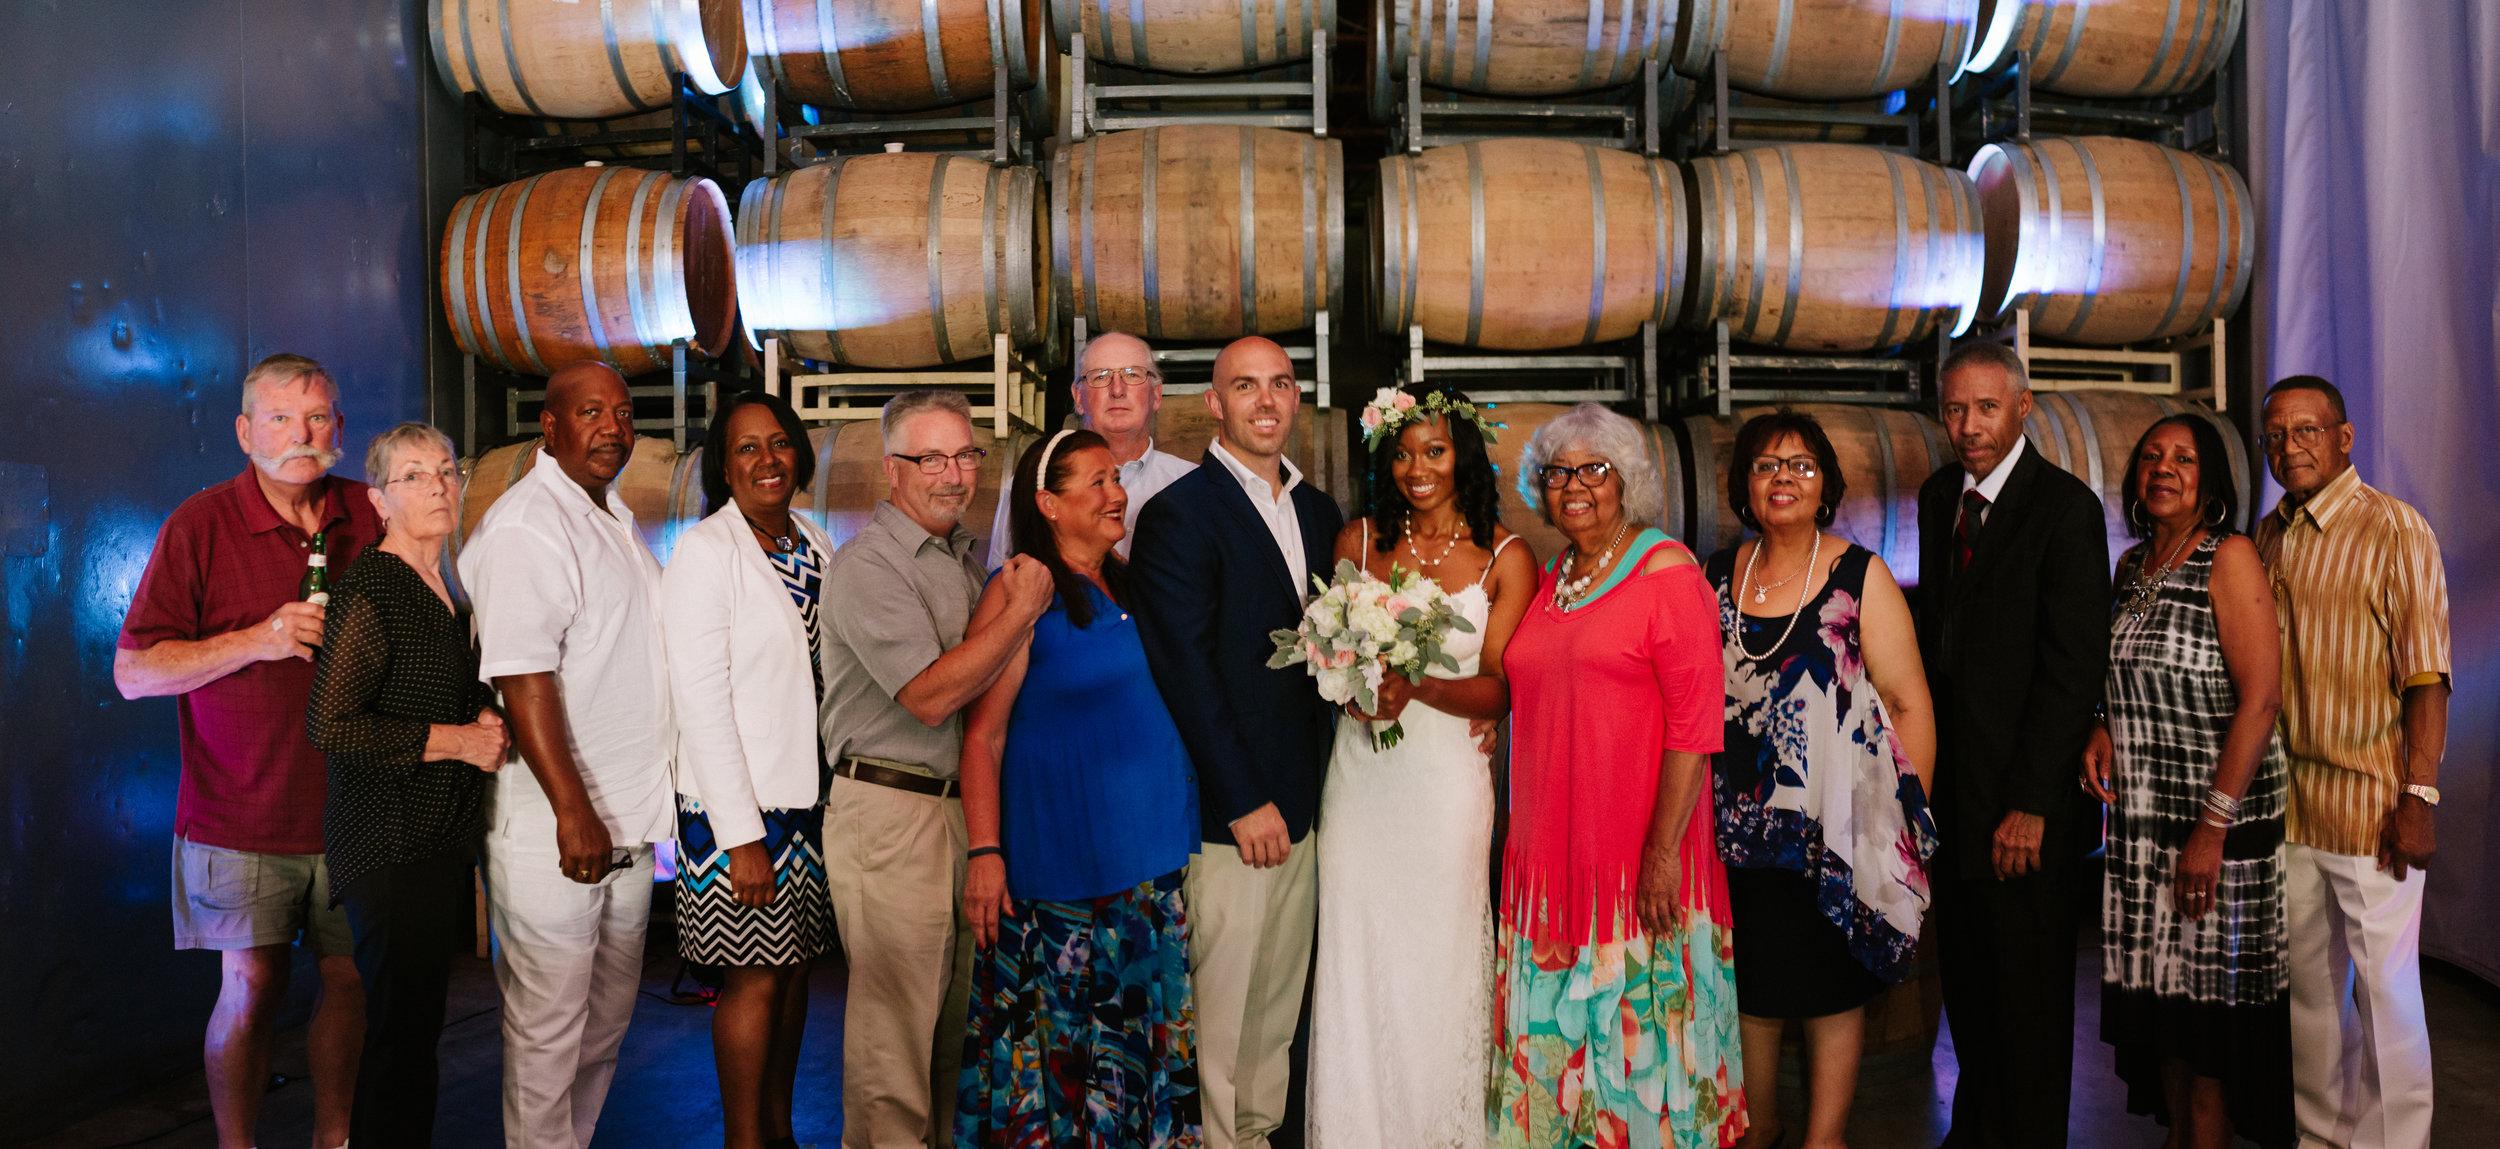 2017.09.16 Ashley and Chuck O'Day Quantam Leap Winery Wedding (205 of 462).jpg